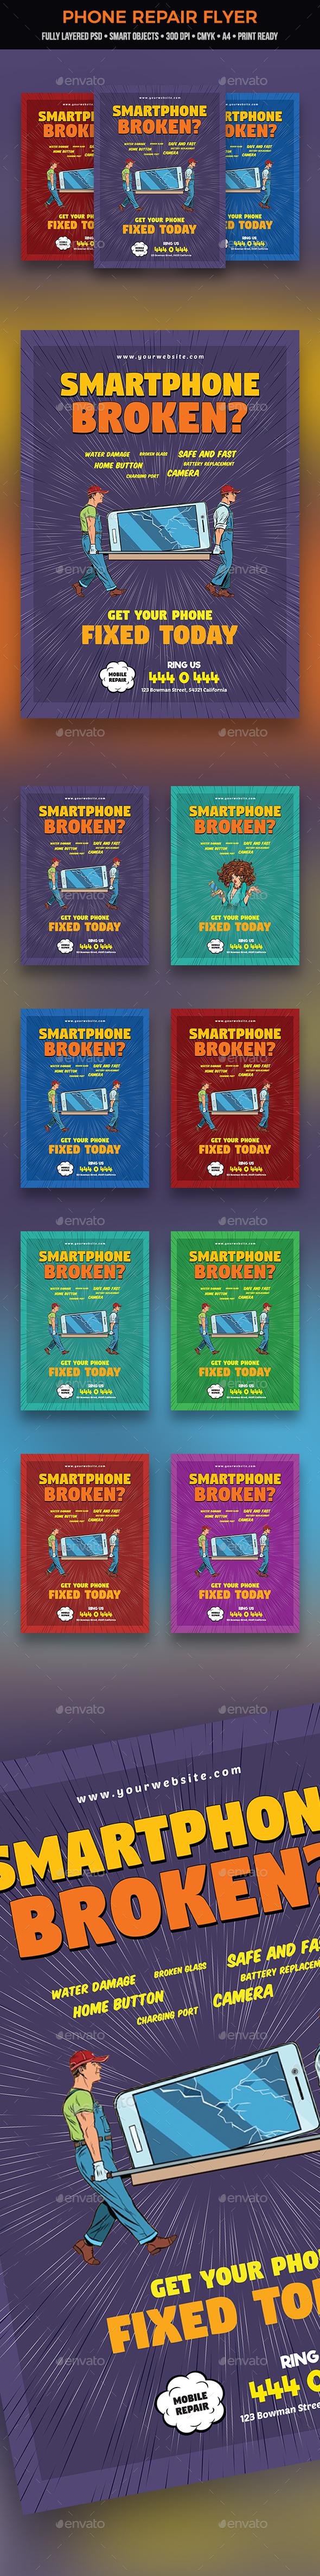 Phone Repair Flyer - Commerce Flyers